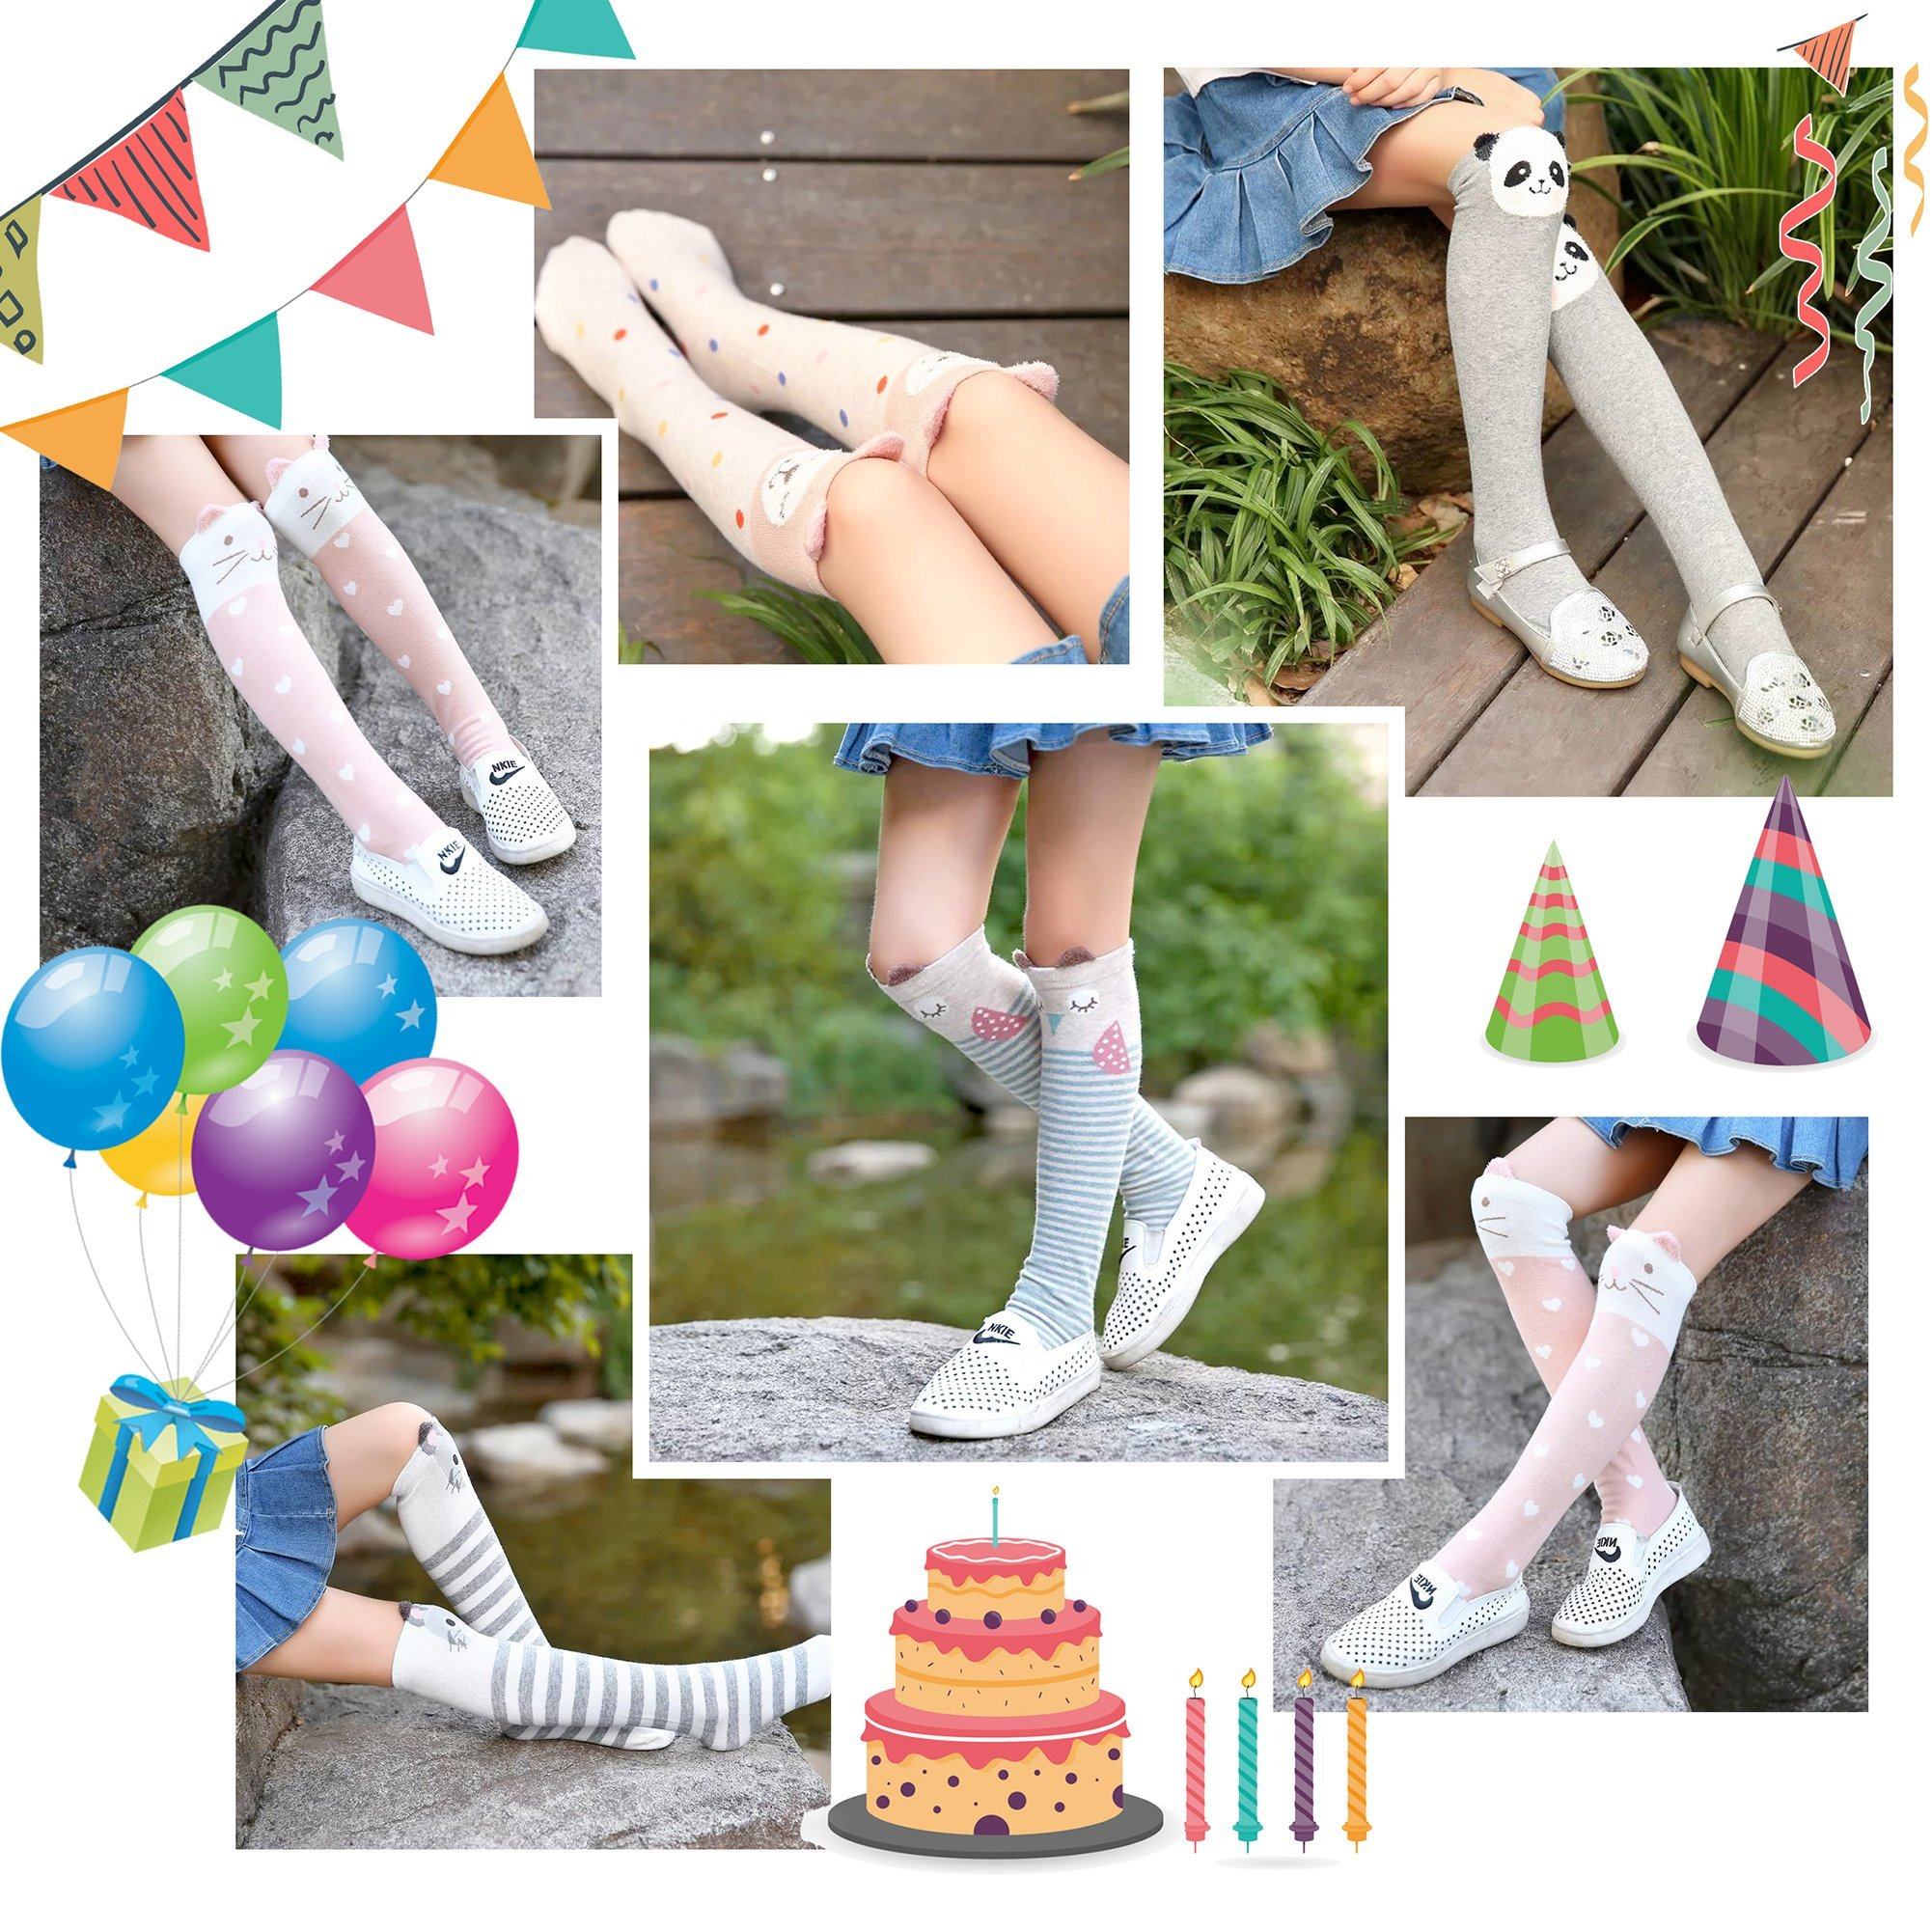 Color City Kids Girls Socks Knee High Stockings Cartoon Animal Theme Cotton Socks (6 Pairs) by Color City (Image #7)